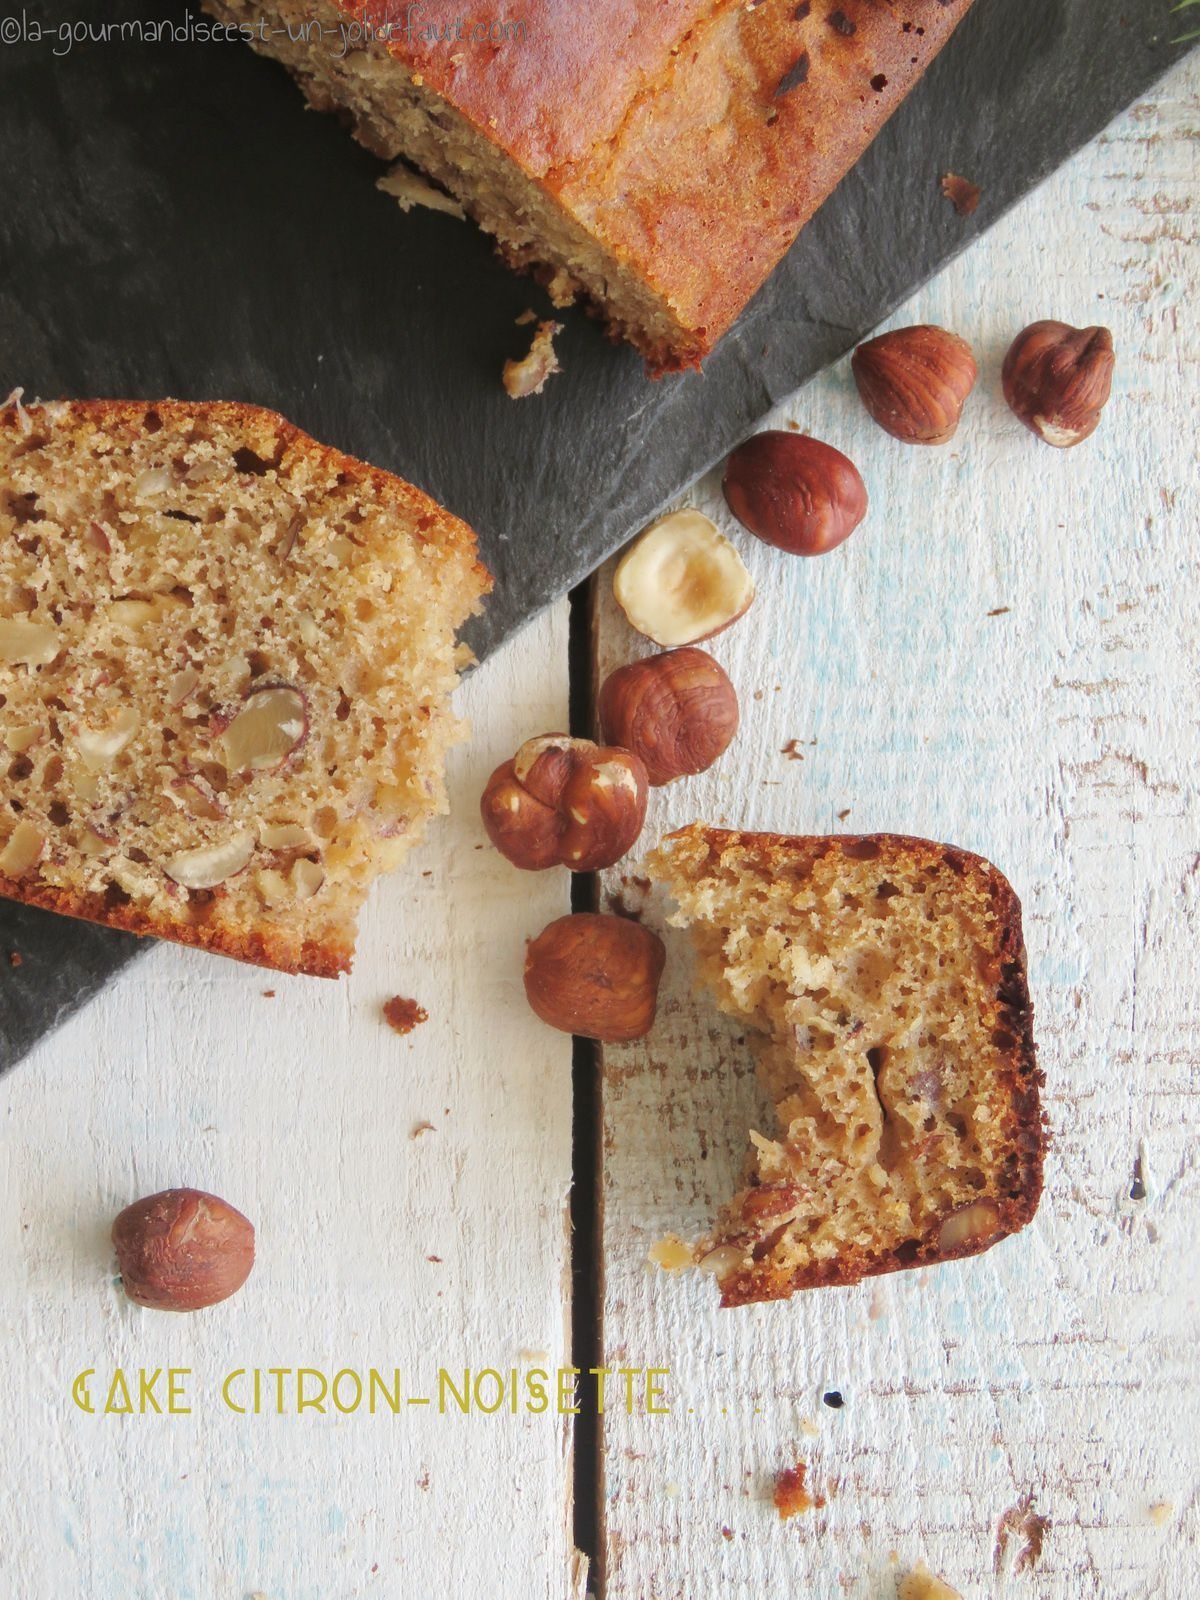 Cake citron-noisette